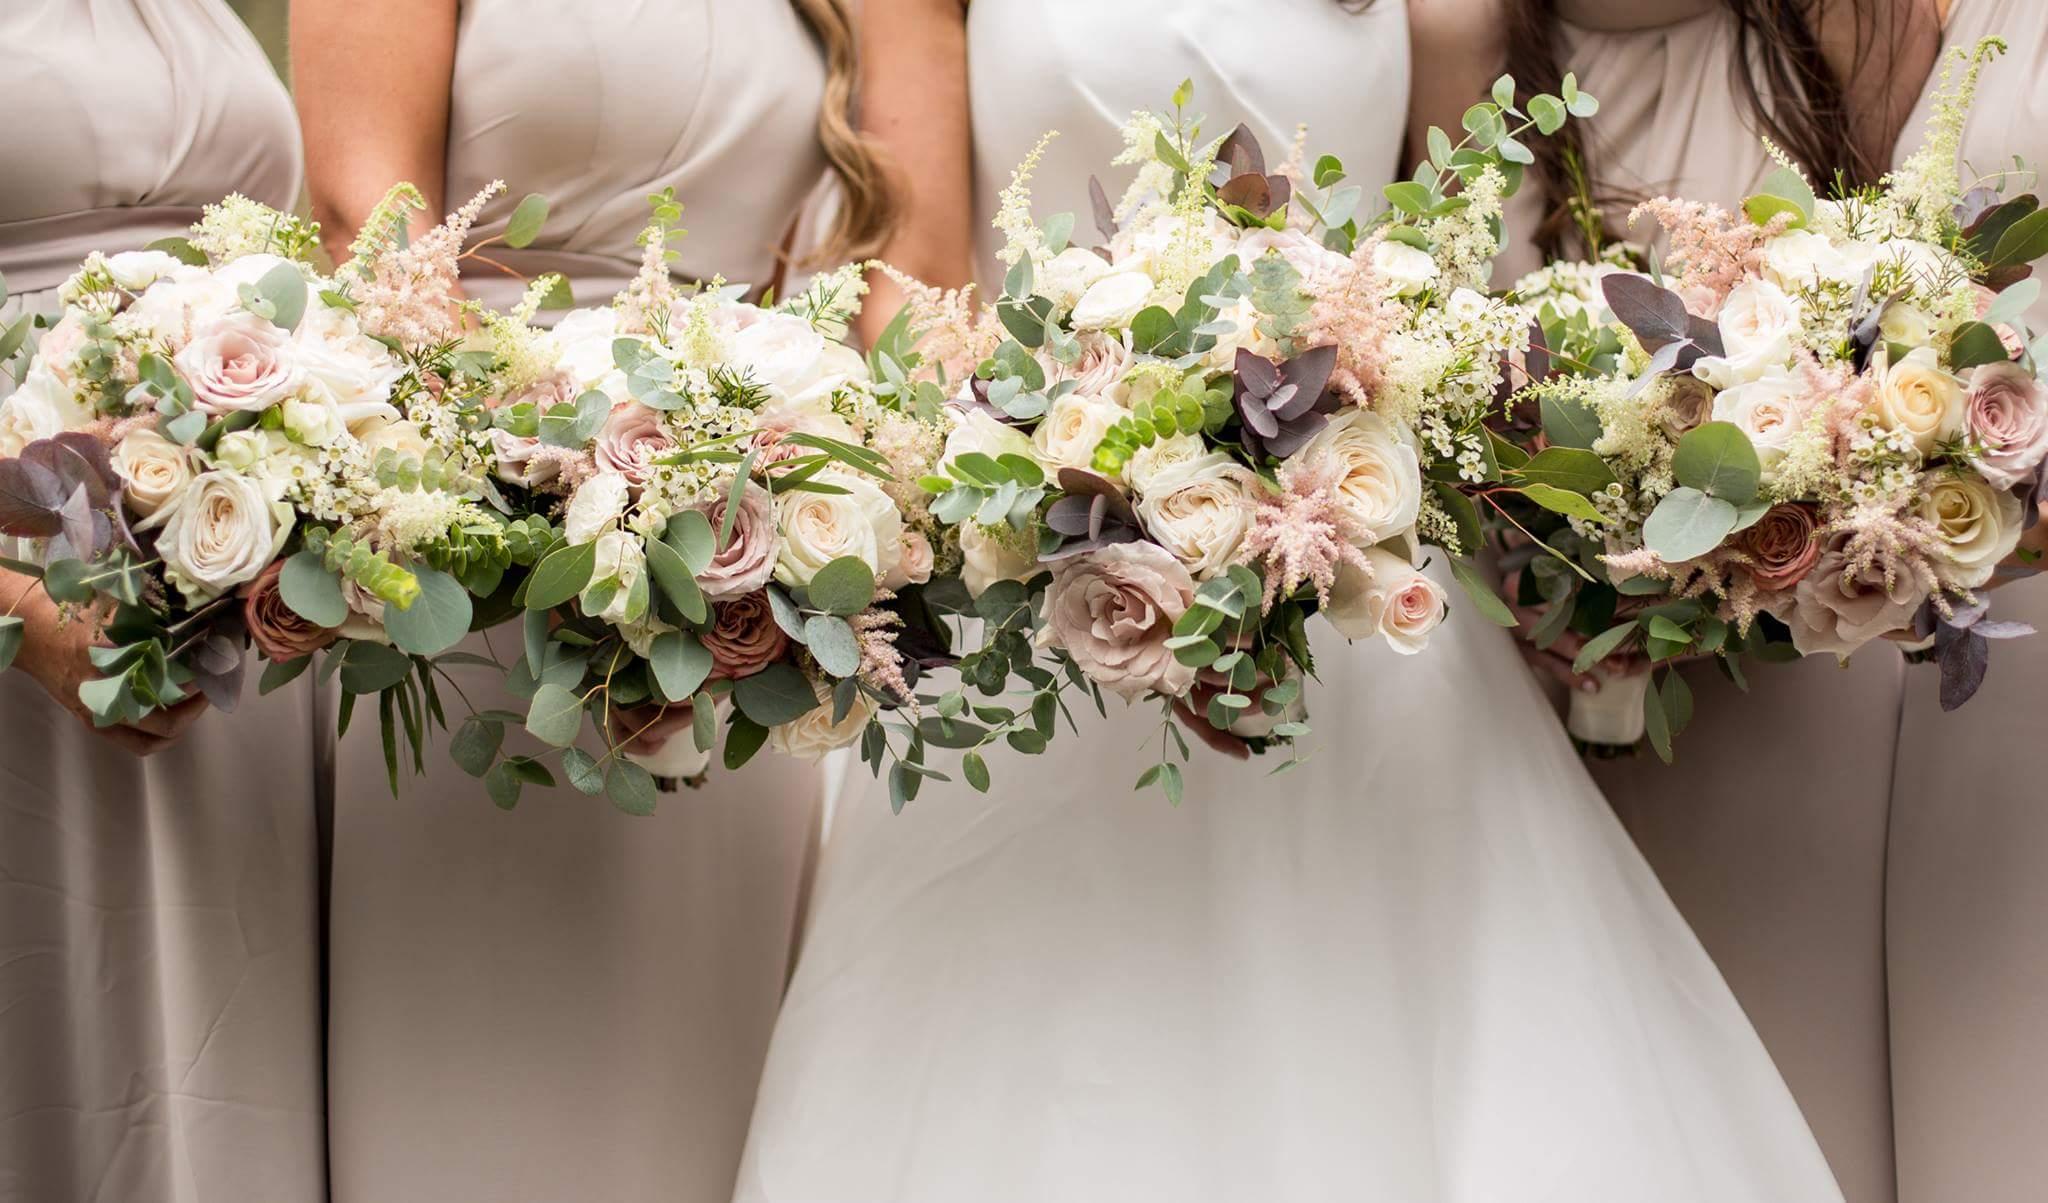 Top Wedding Flower Trends For 2018